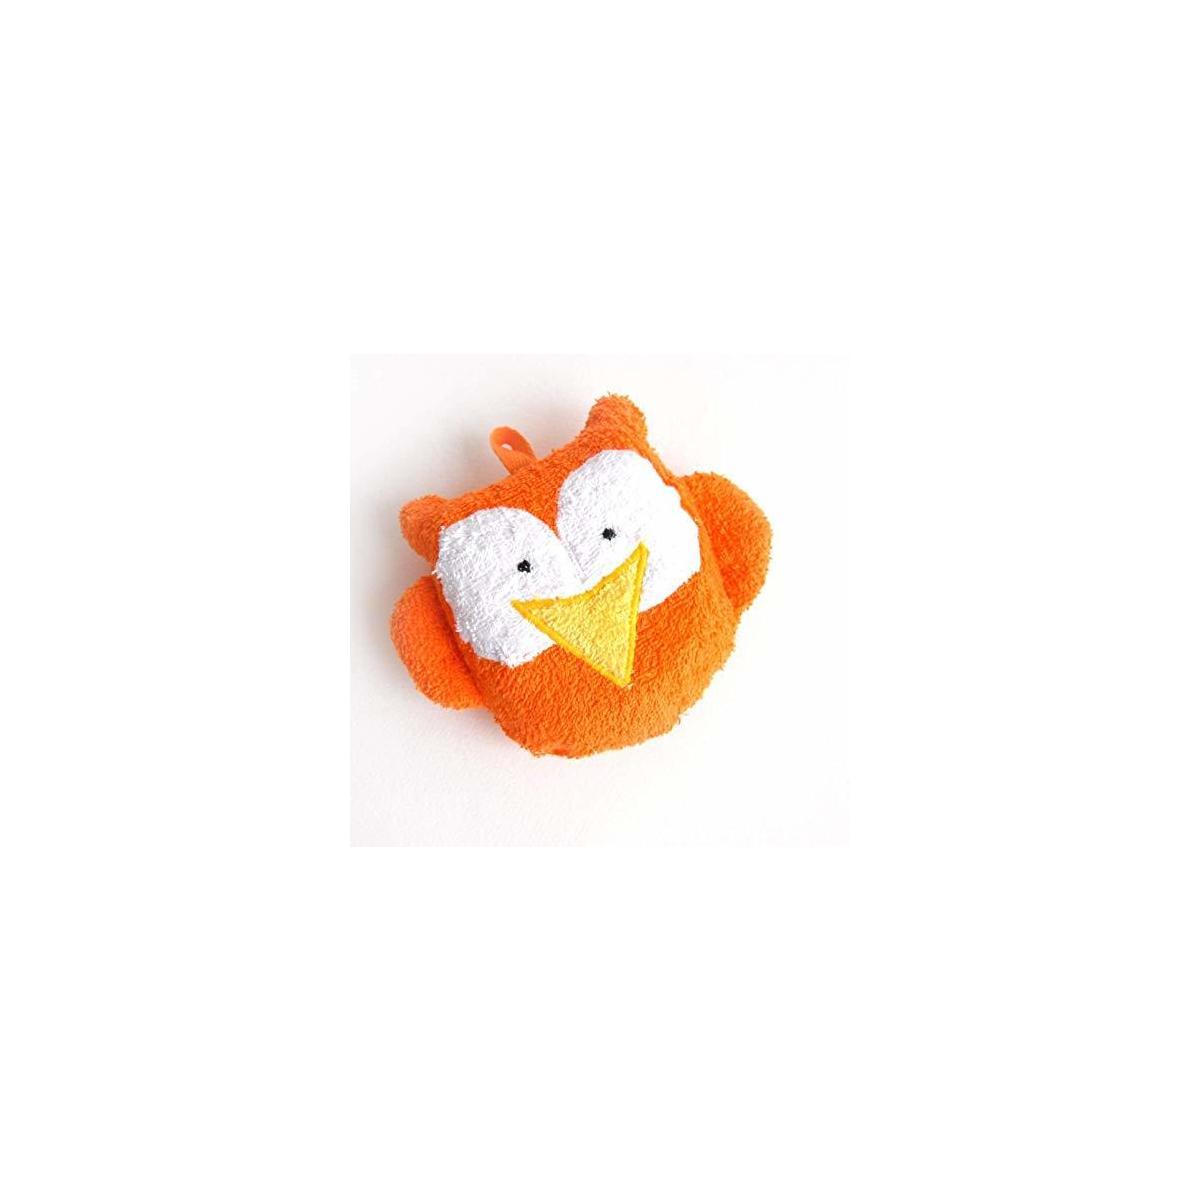 Baby Bath Toy Sponge Owl Washcloth Animal Newbaby Toddler Gift